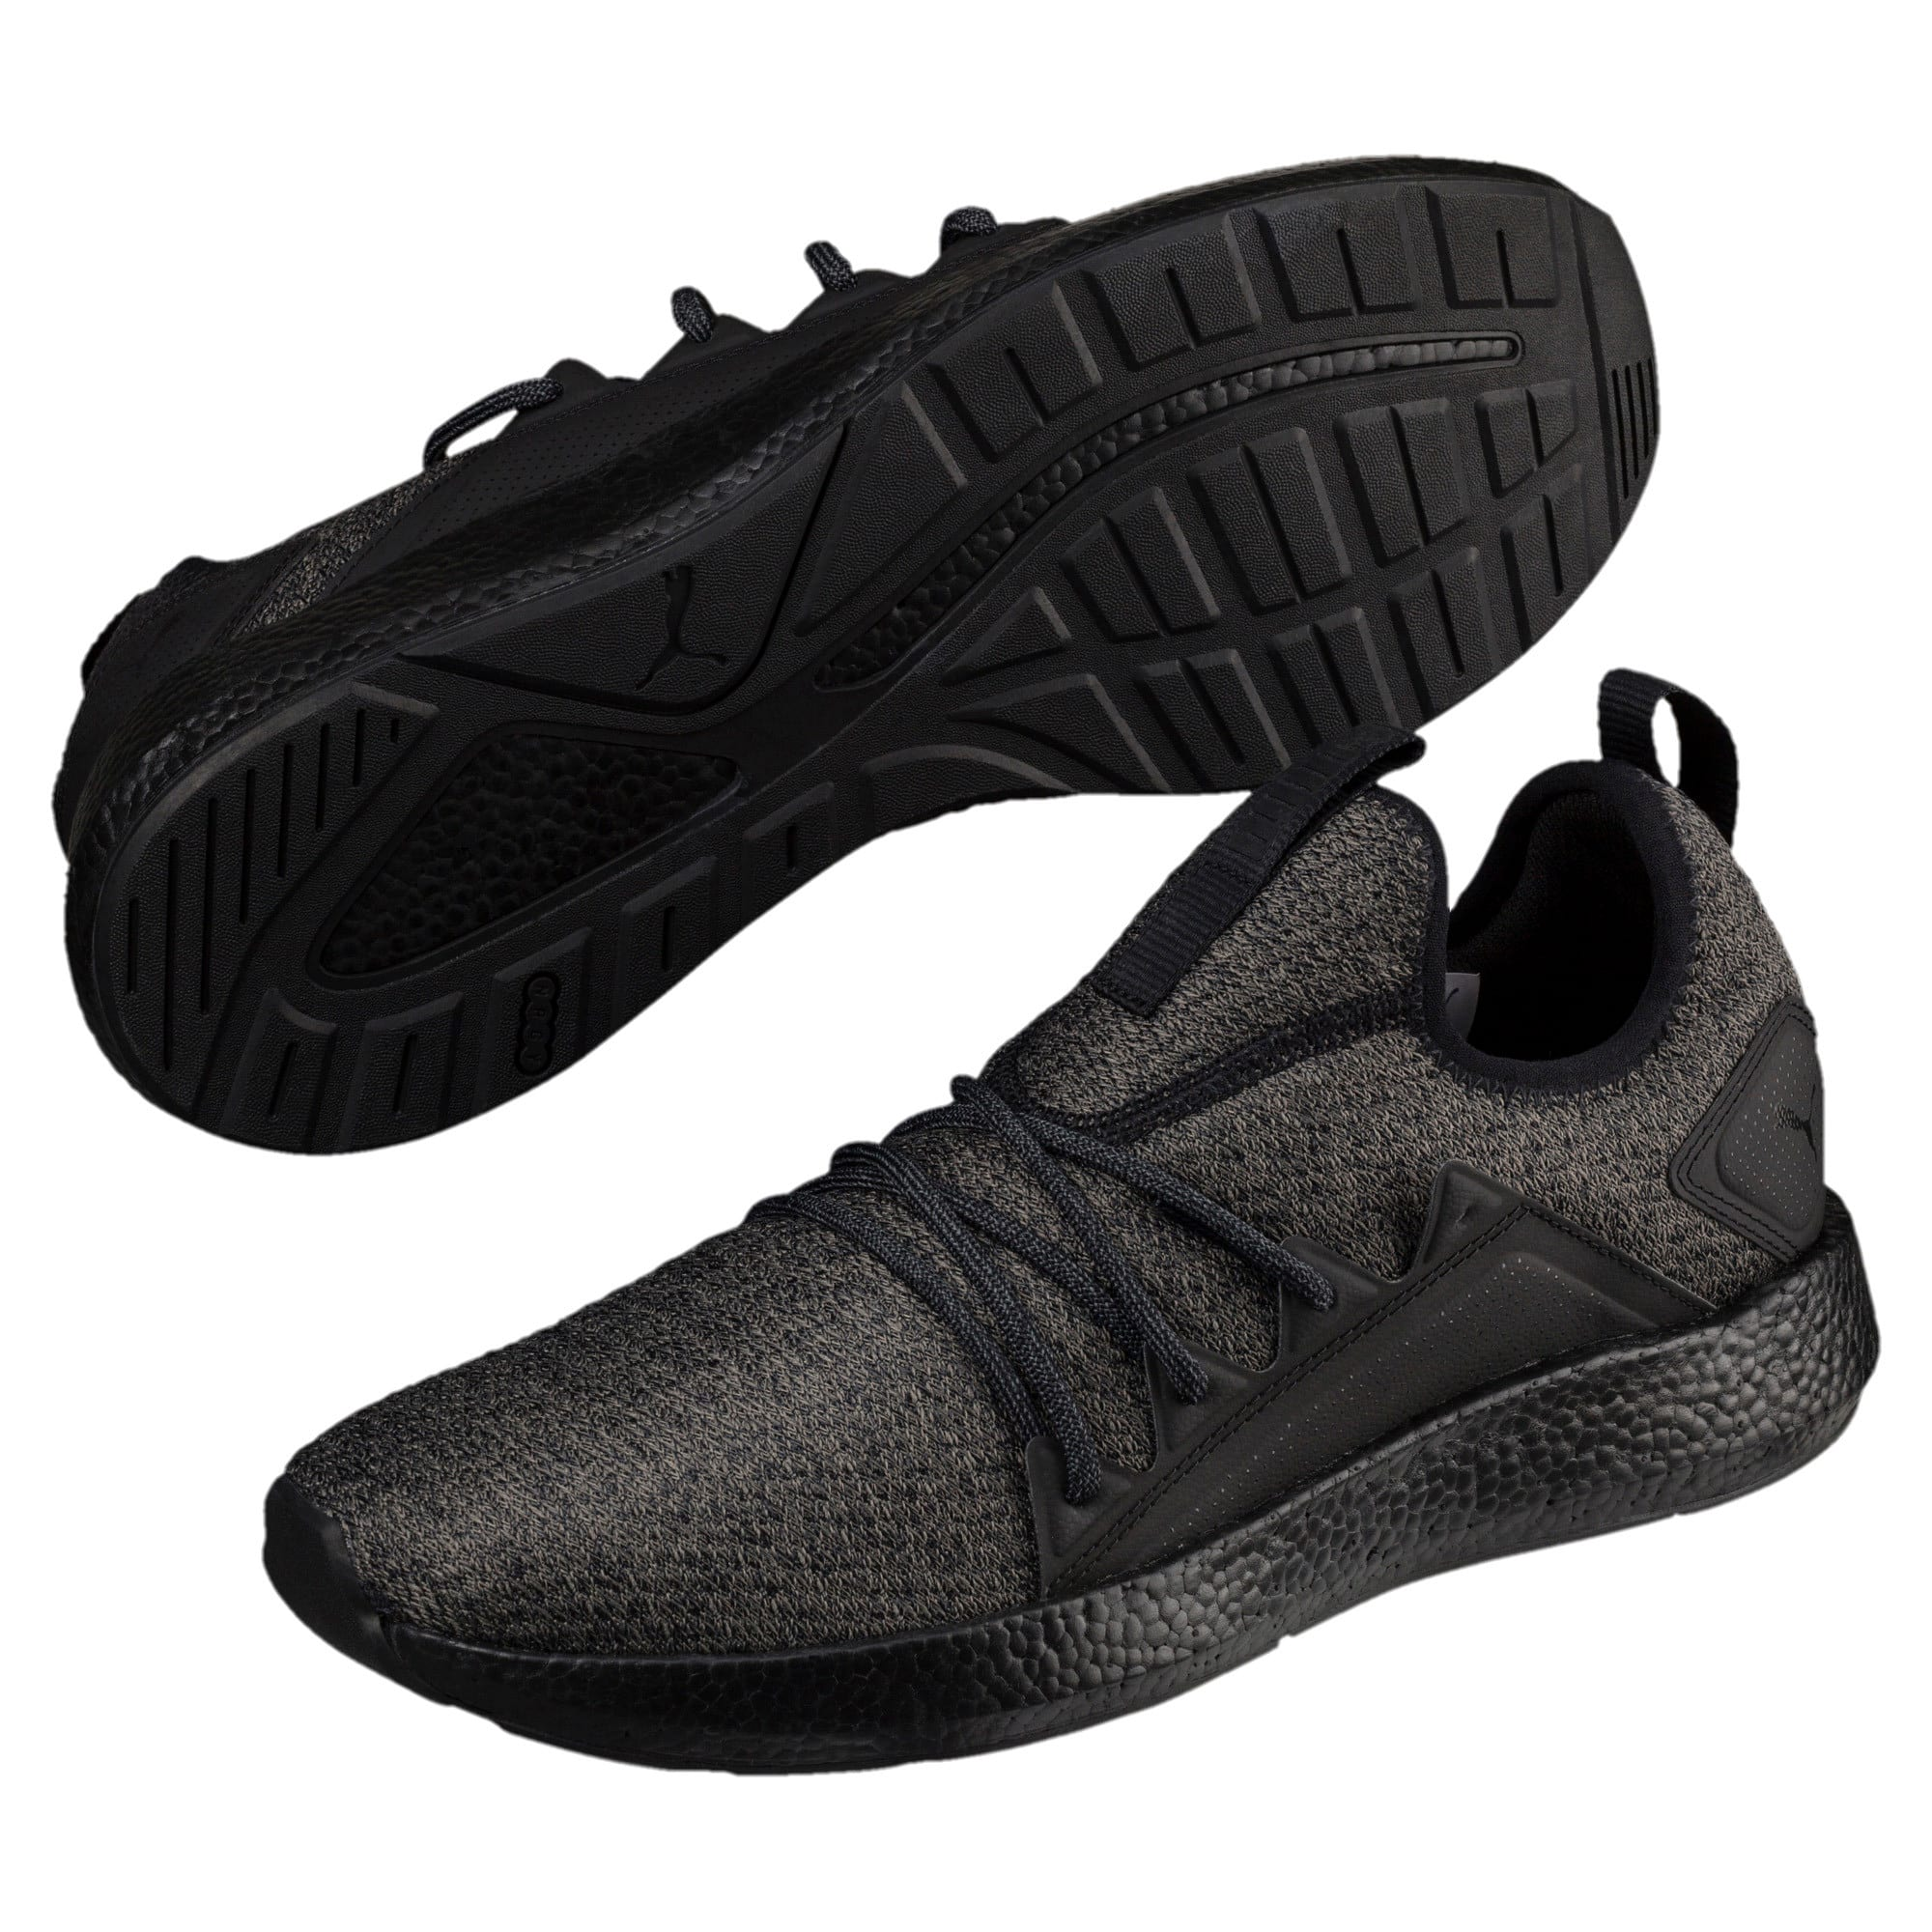 Thumbnail 2 of NRGY Neko Knit Men's Running Shoes, Puma Black-Puma Black, medium